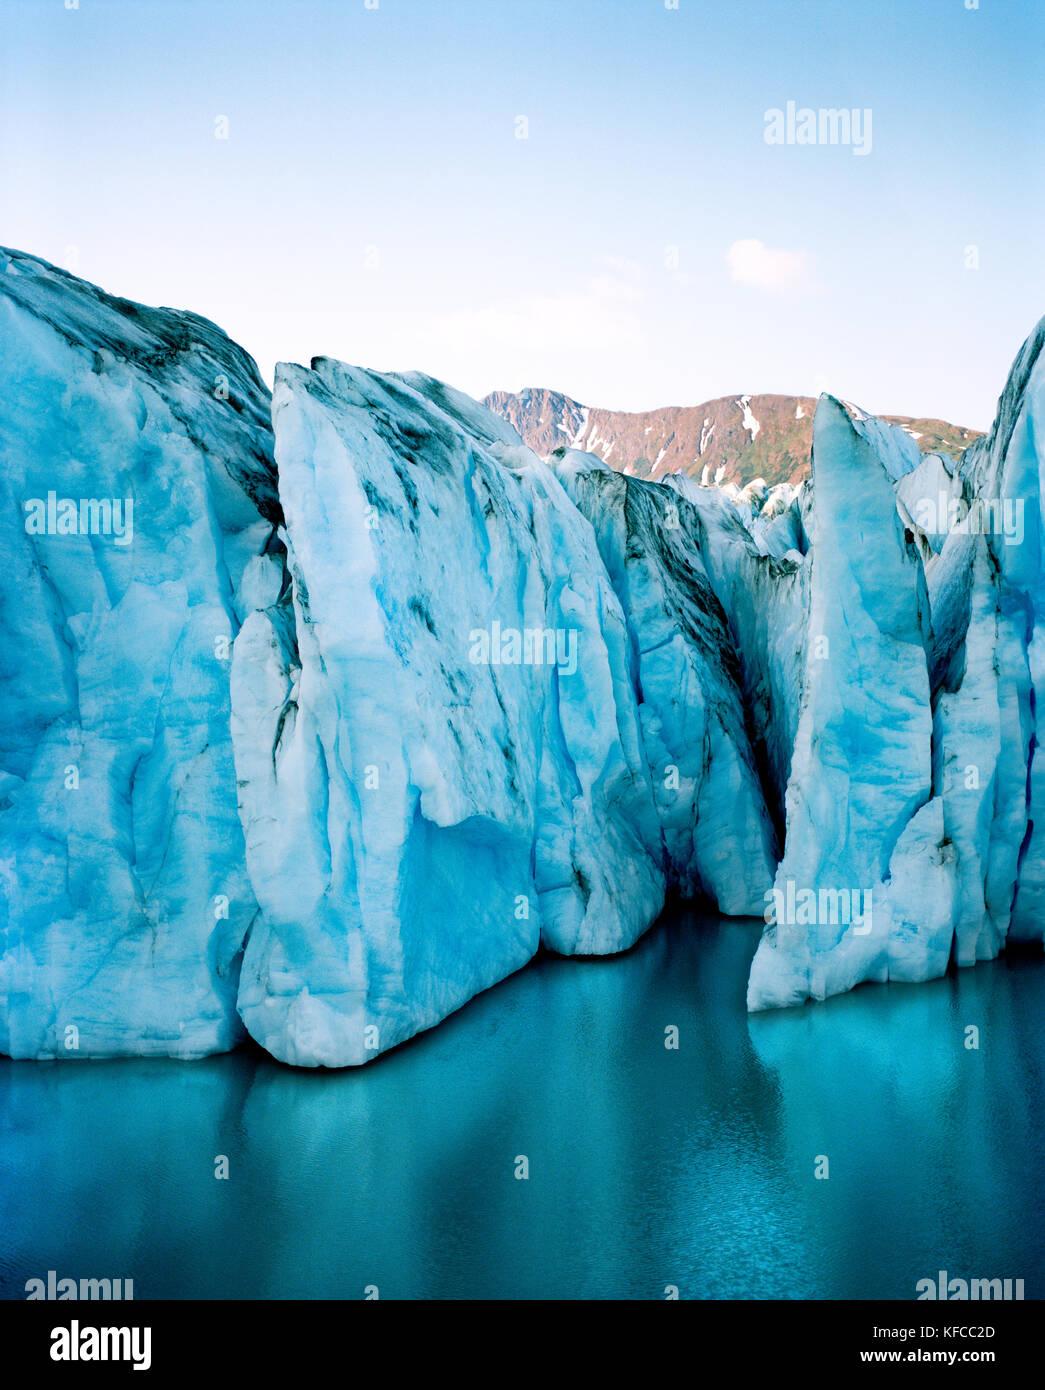 USA, Alaska, Colony Glacier in Chugach State Park in the Chugach Mountains (B&W) - Stock Image